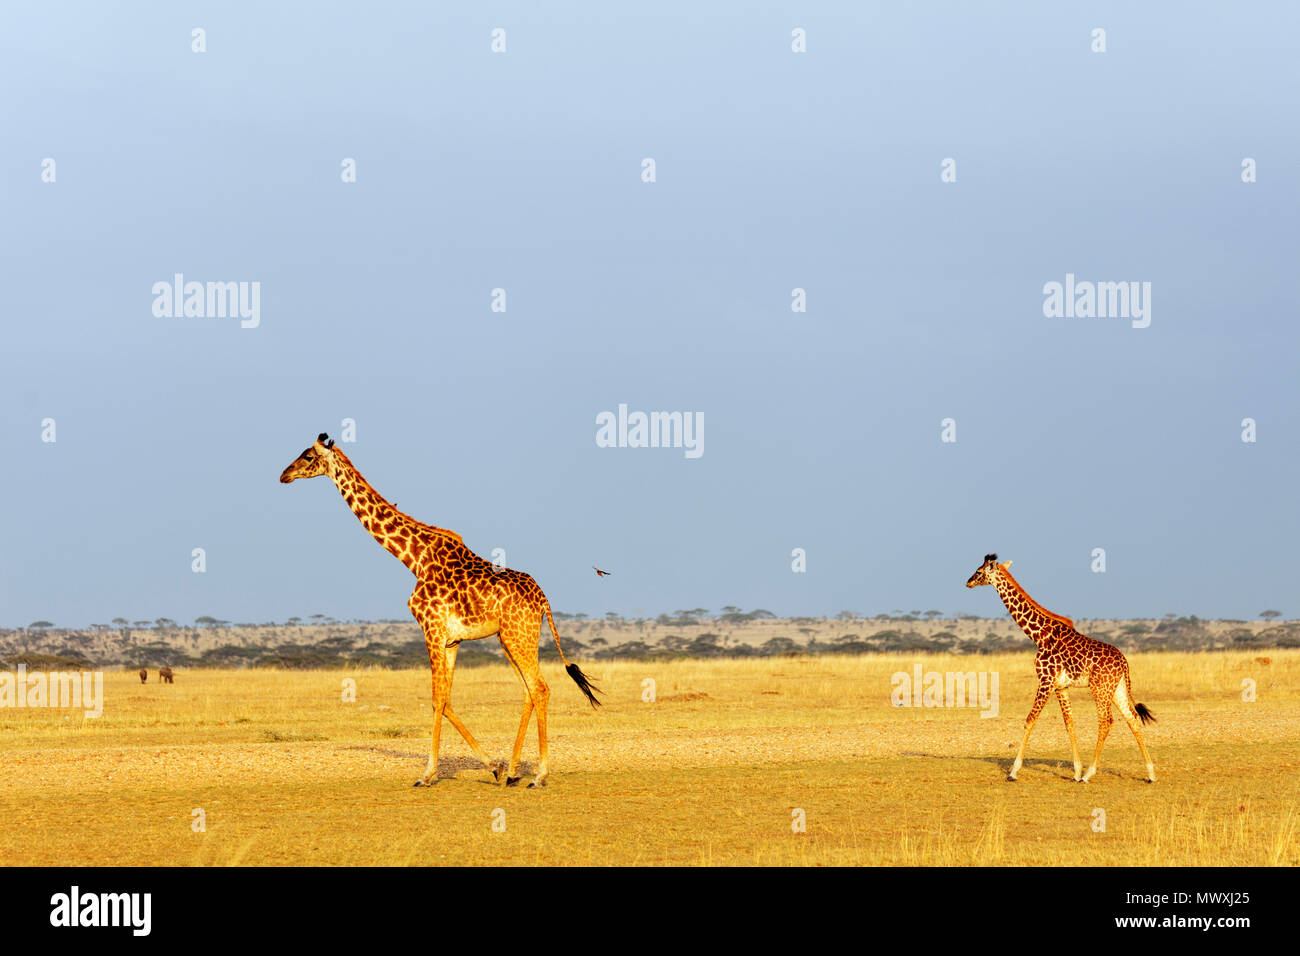 Giraffe (Giraffa camelopardalis), Serengeti National Park, UNESCO World Heritage Site, Tanzania, East Africa, Africa - Stock Image